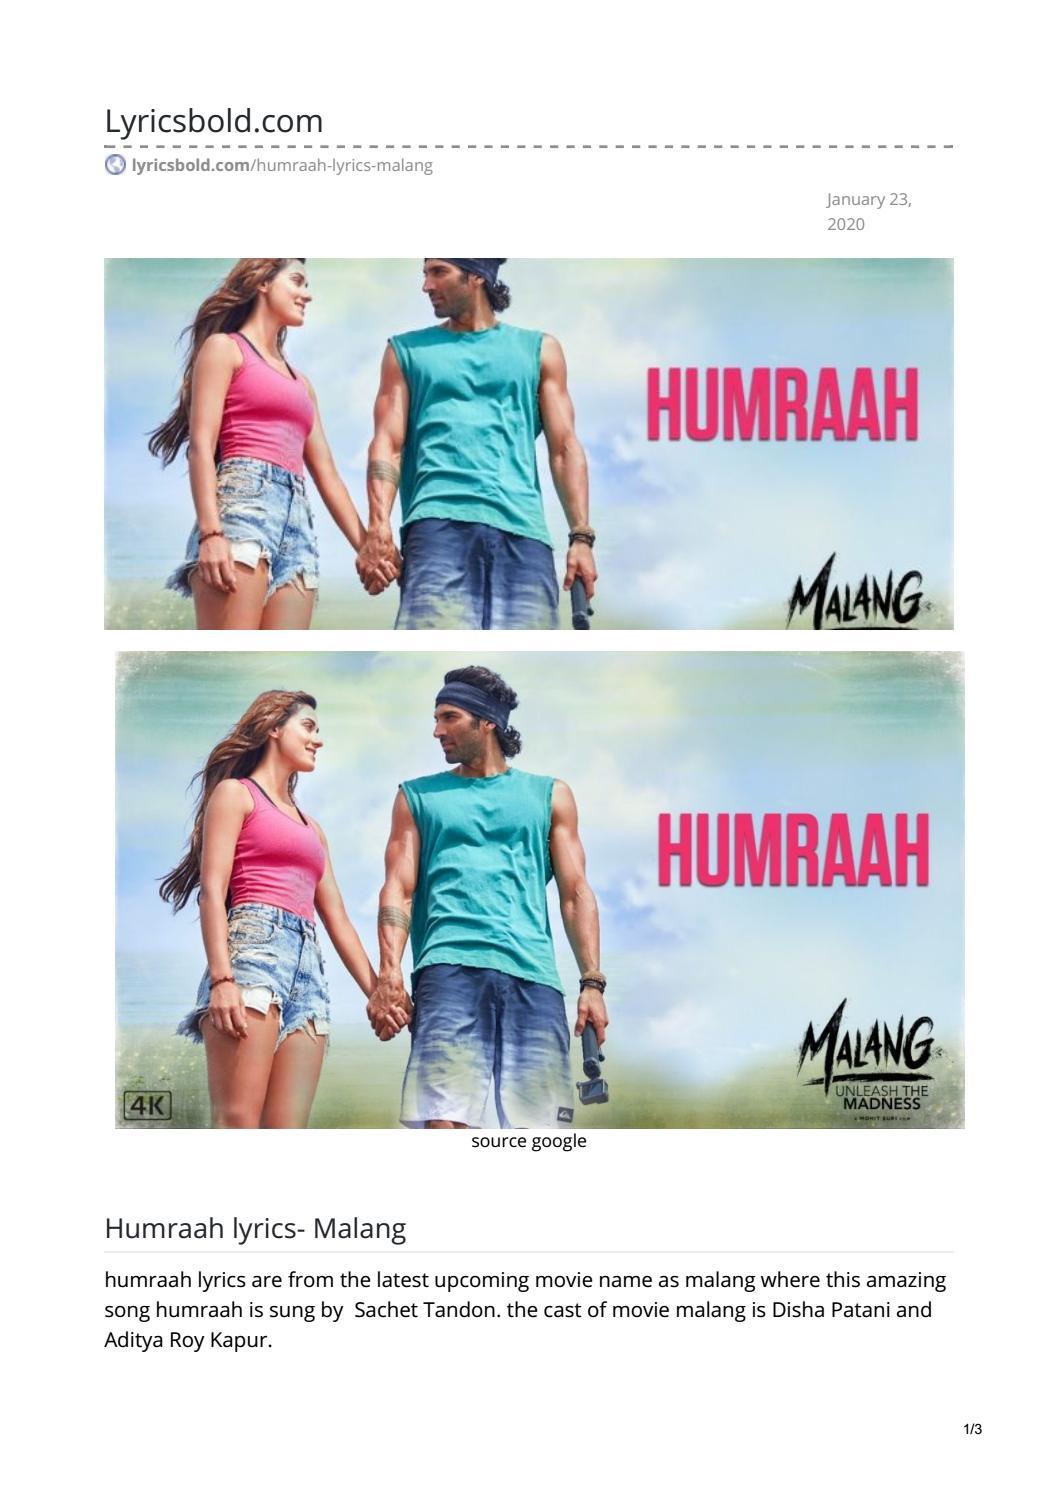 Humraah Lyrics By Swarajsirsat123 Issuu